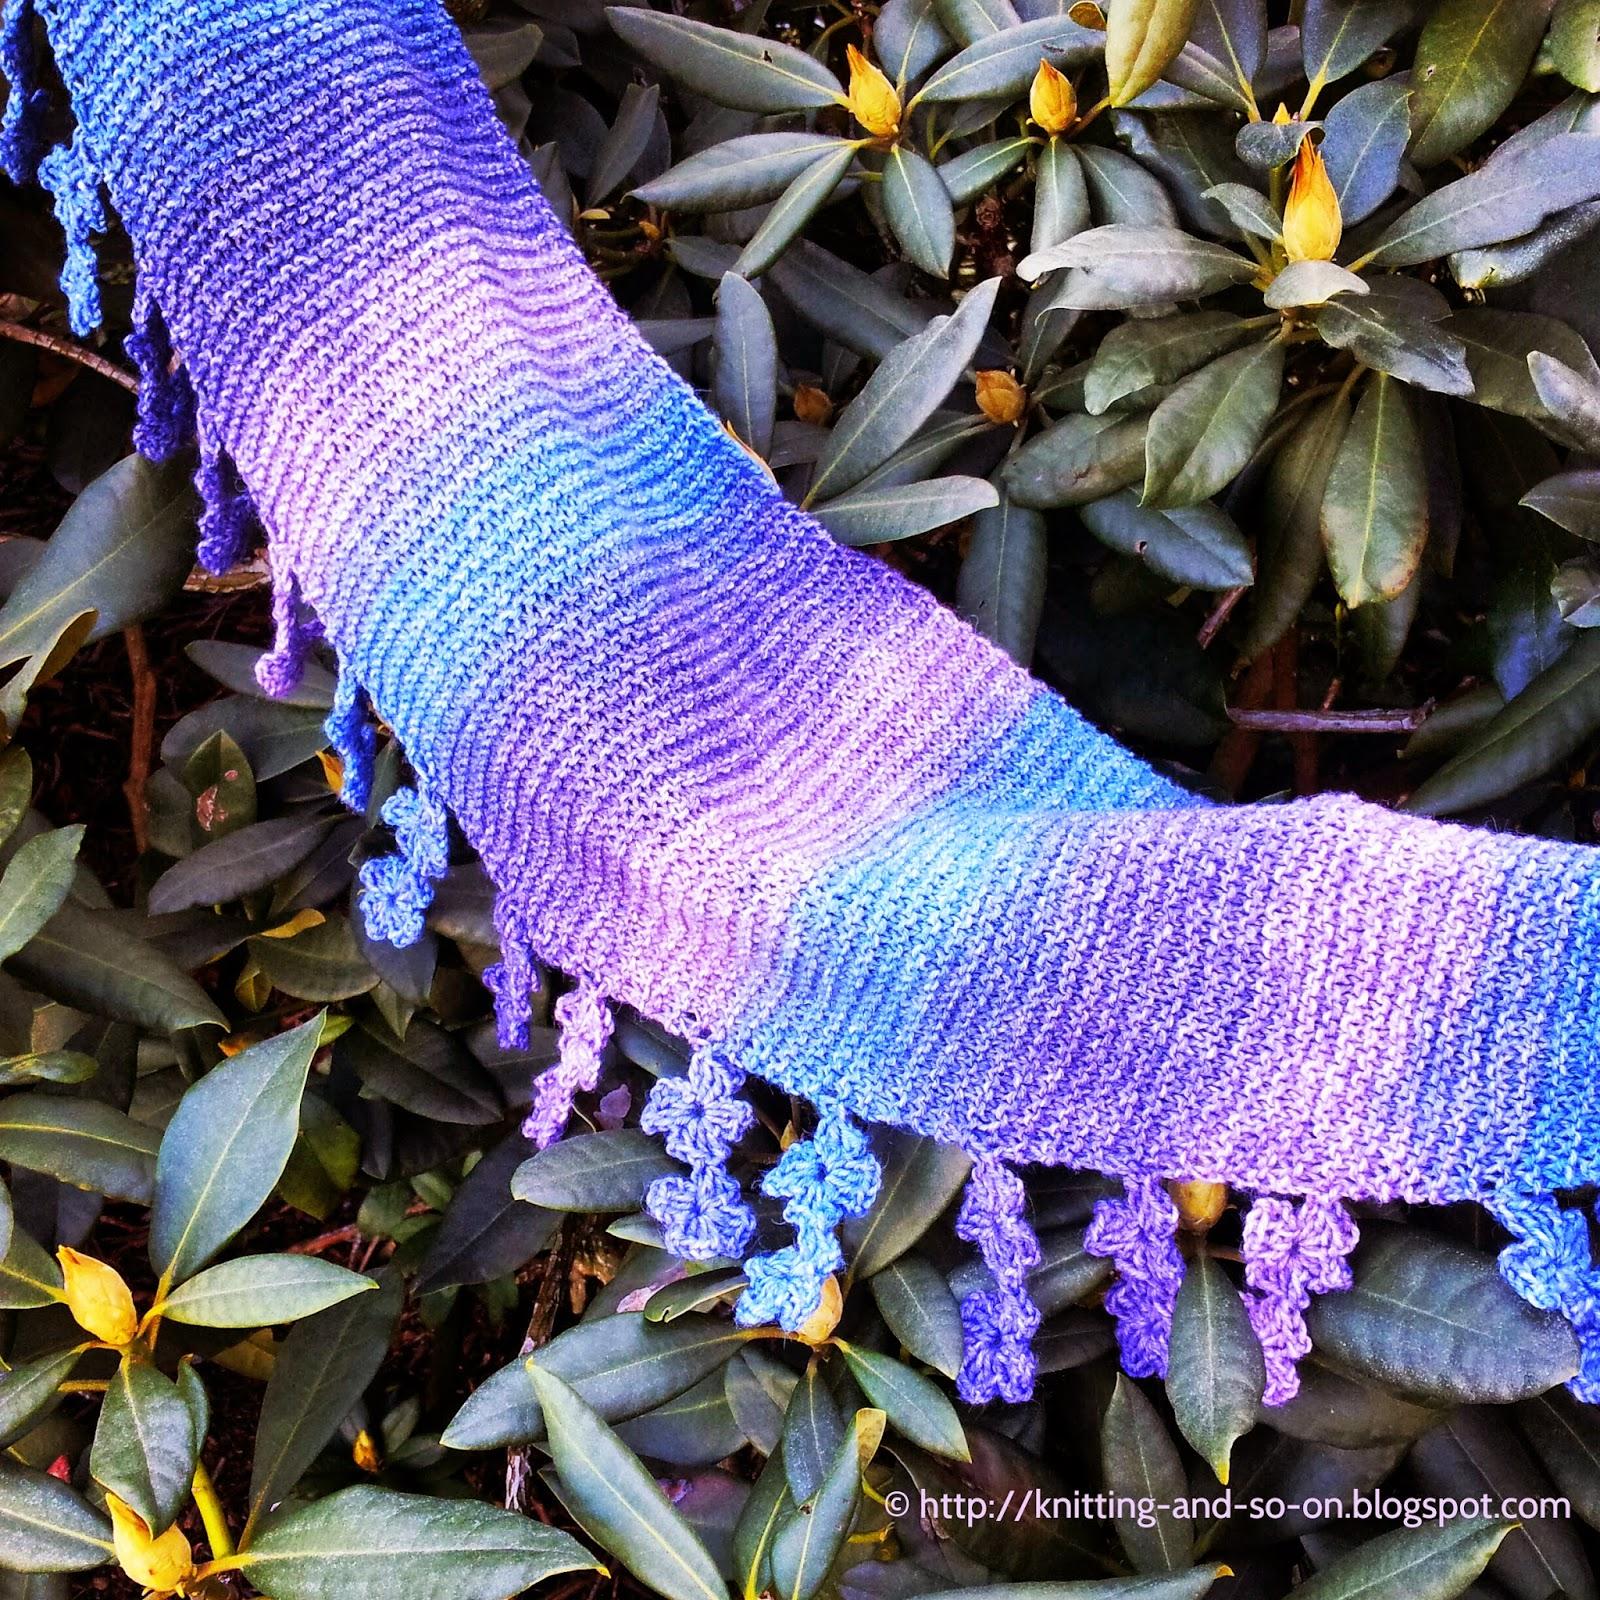 Free Knitting/Crochet Pattern: Falling Blossoms Scarf